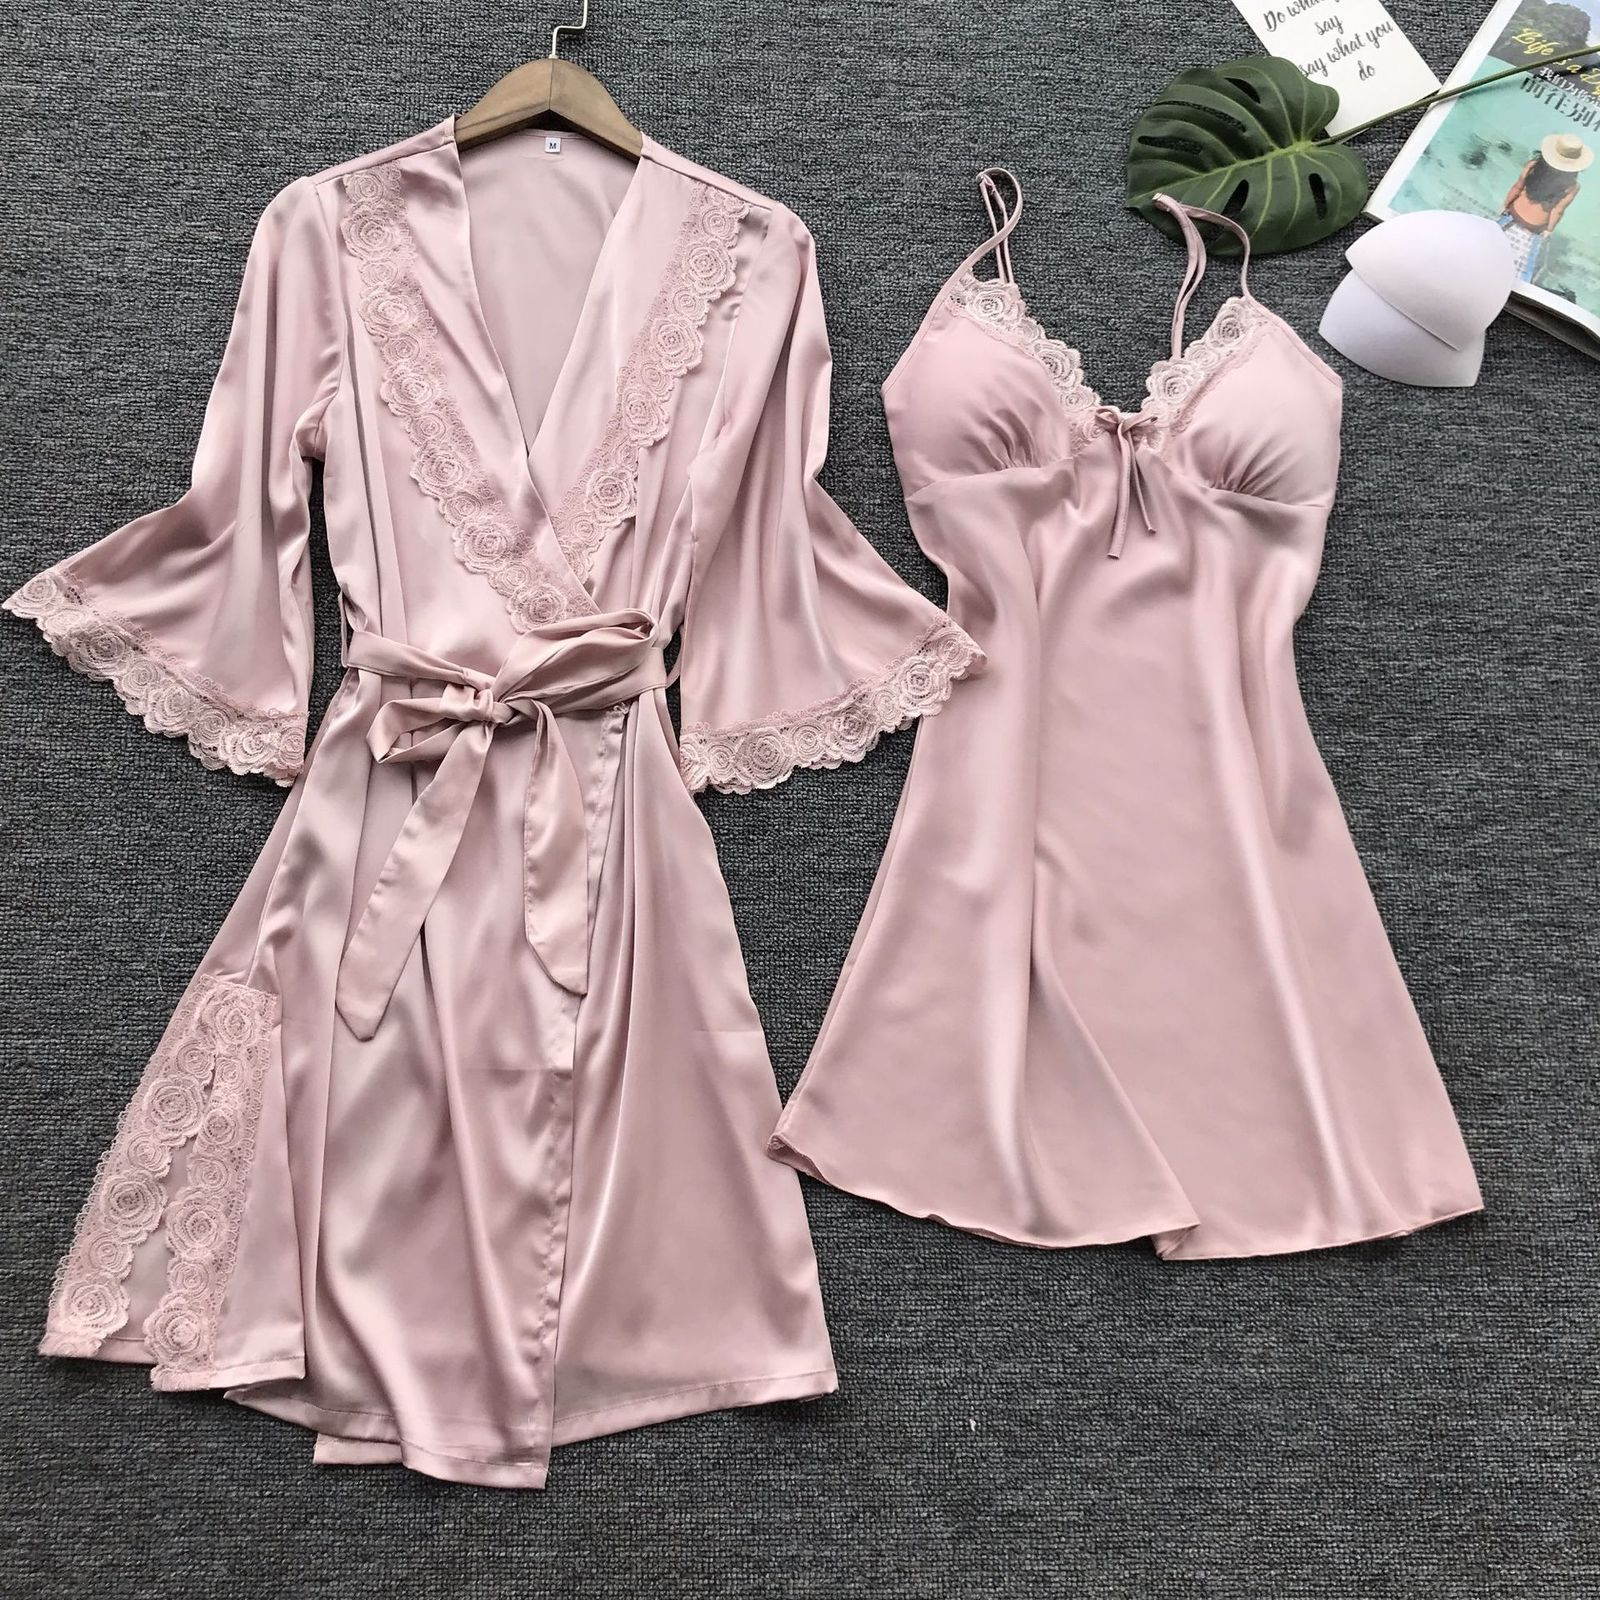 2019 Spring Autumn Satin Sexy Lingerie Women Pastel Goth Silk Lace Robe Solid Dress Nightdress Sleepwear Kimono Gown Sets Robe Gown Sets Aliexpress